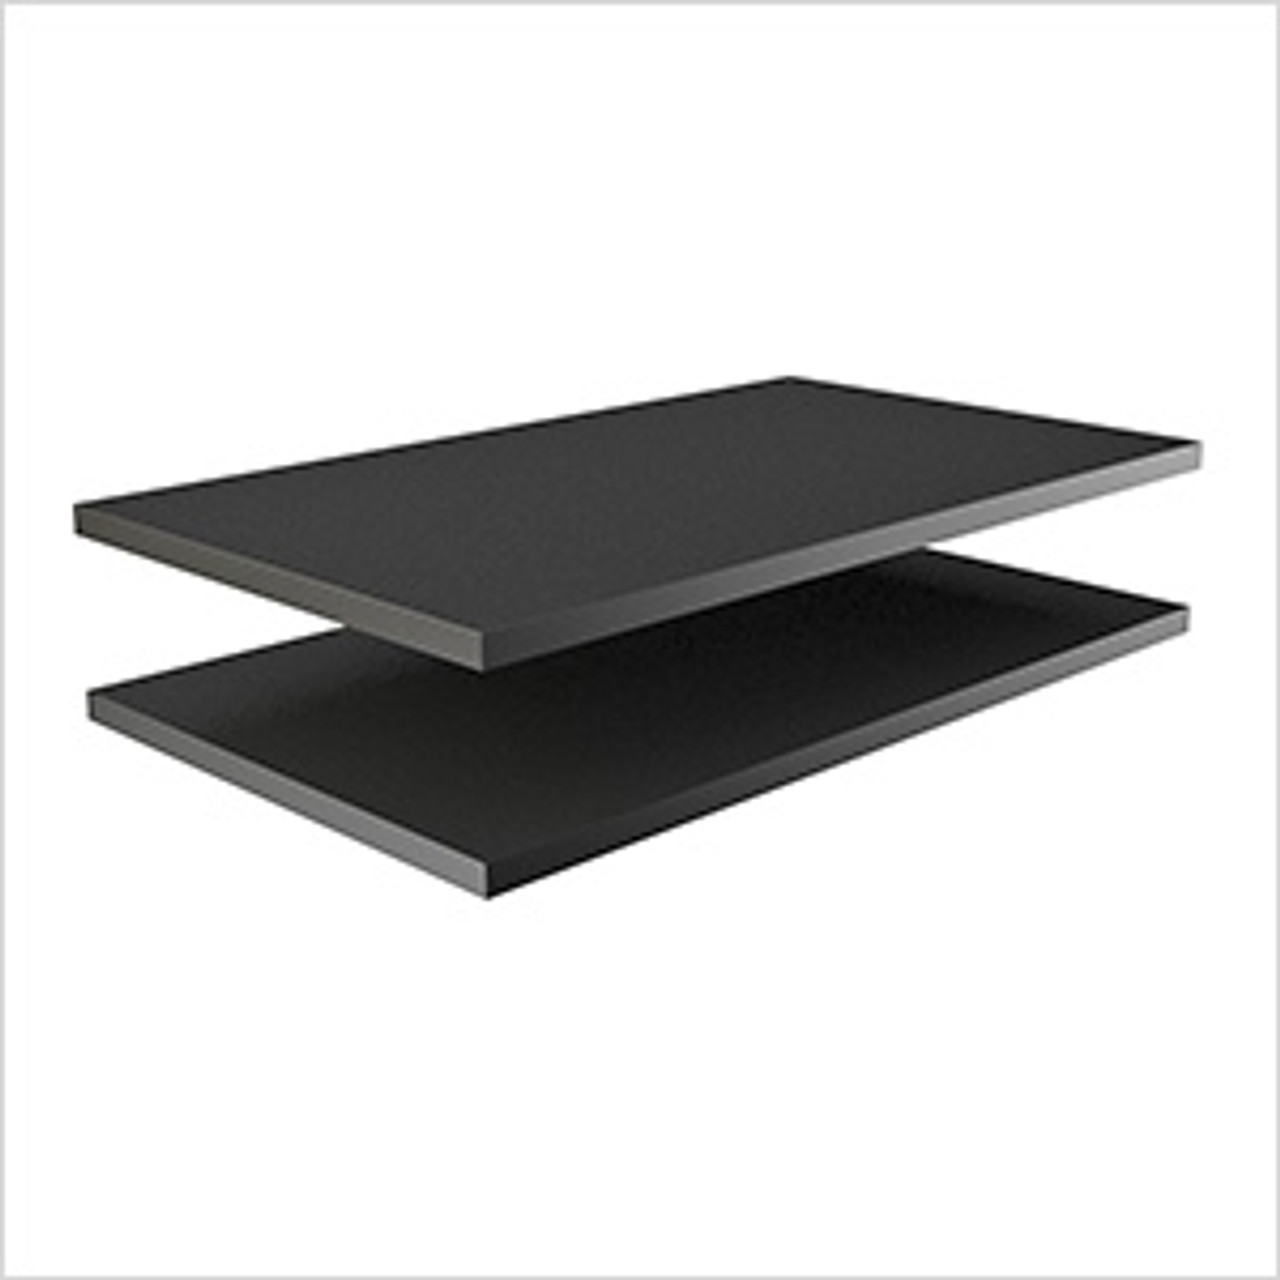 Ulti-MATE Garage 2.0 Series 3-Piece Cabinet Bundle 6' -  Tall Cabinet Kit - Black (UG22624B)